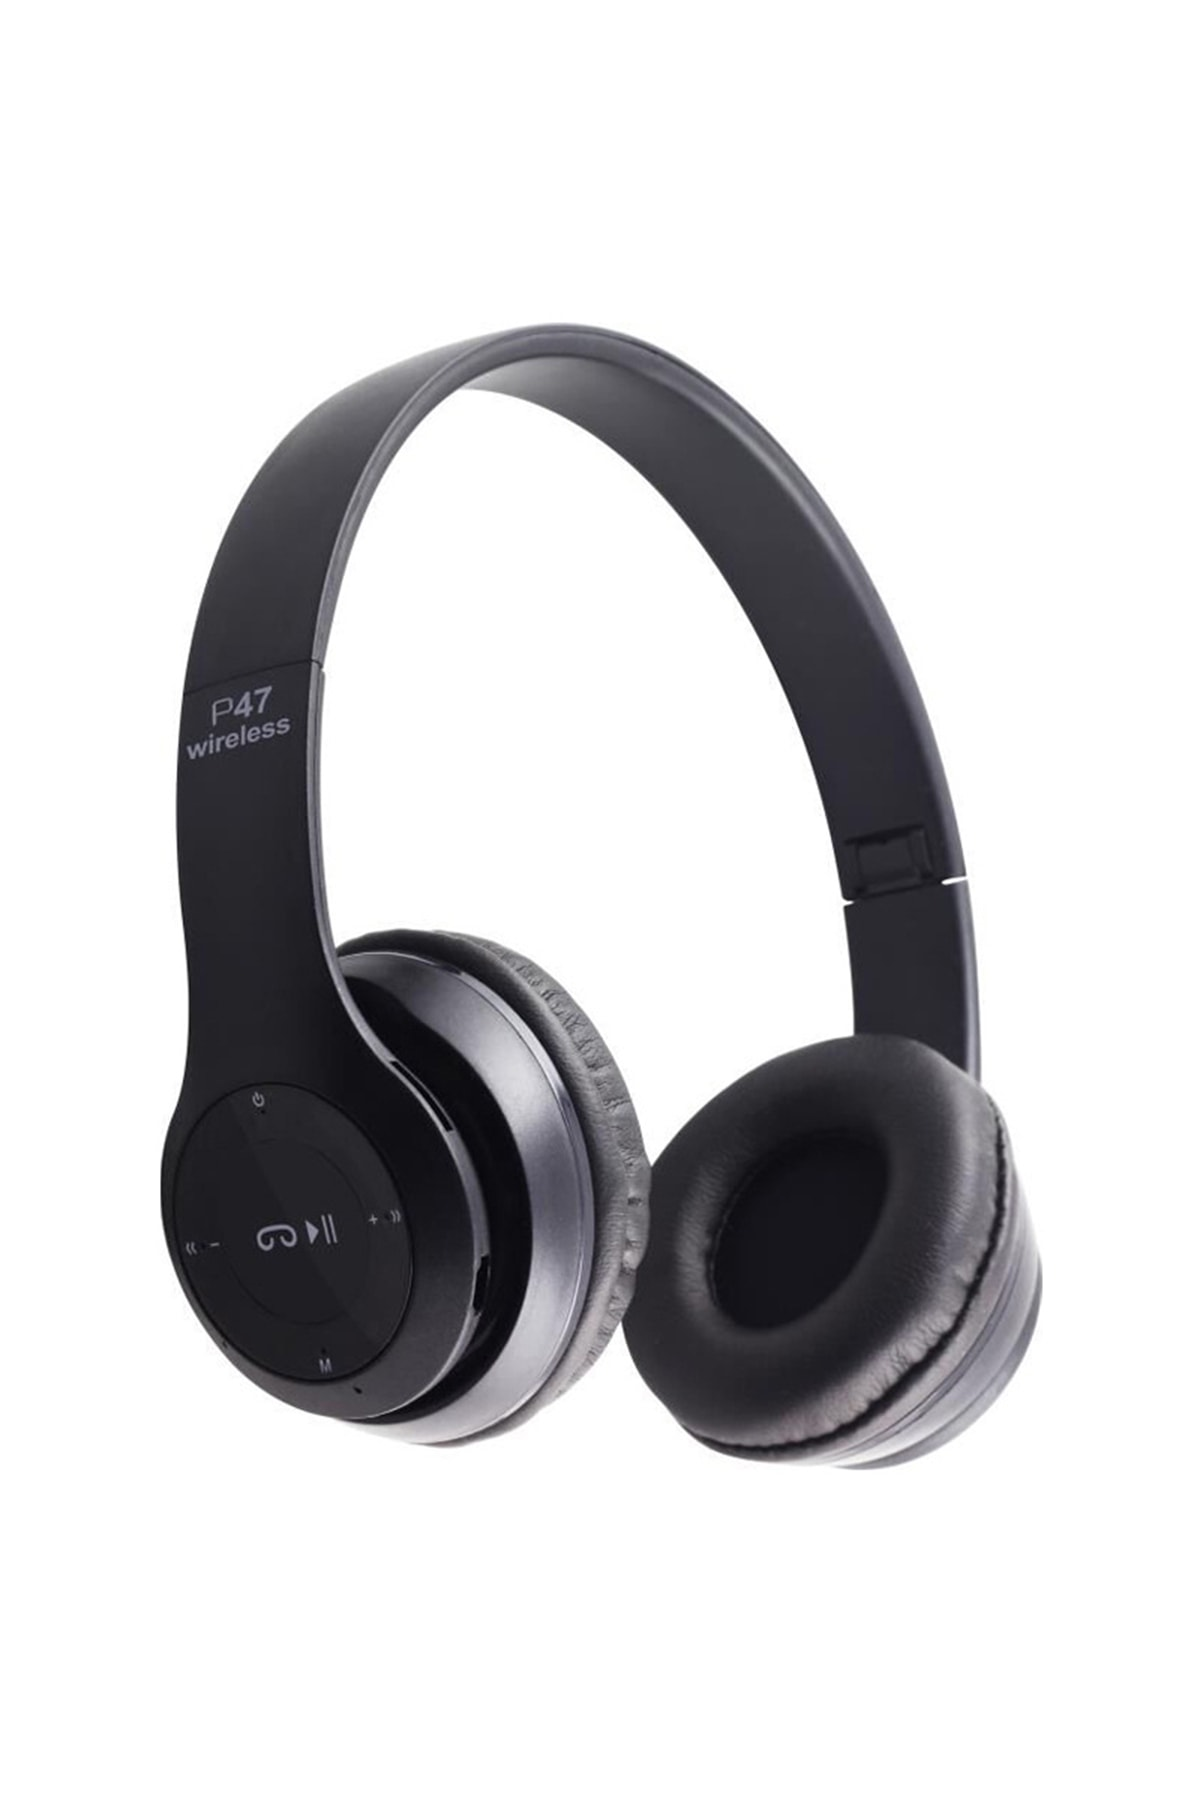 Mkey P47 Wireless Kulaklık, P47 Wireless Headphone Radyolu Versiyon, P47 Kulaklık, P47 Bluetooth Kulaklık 1